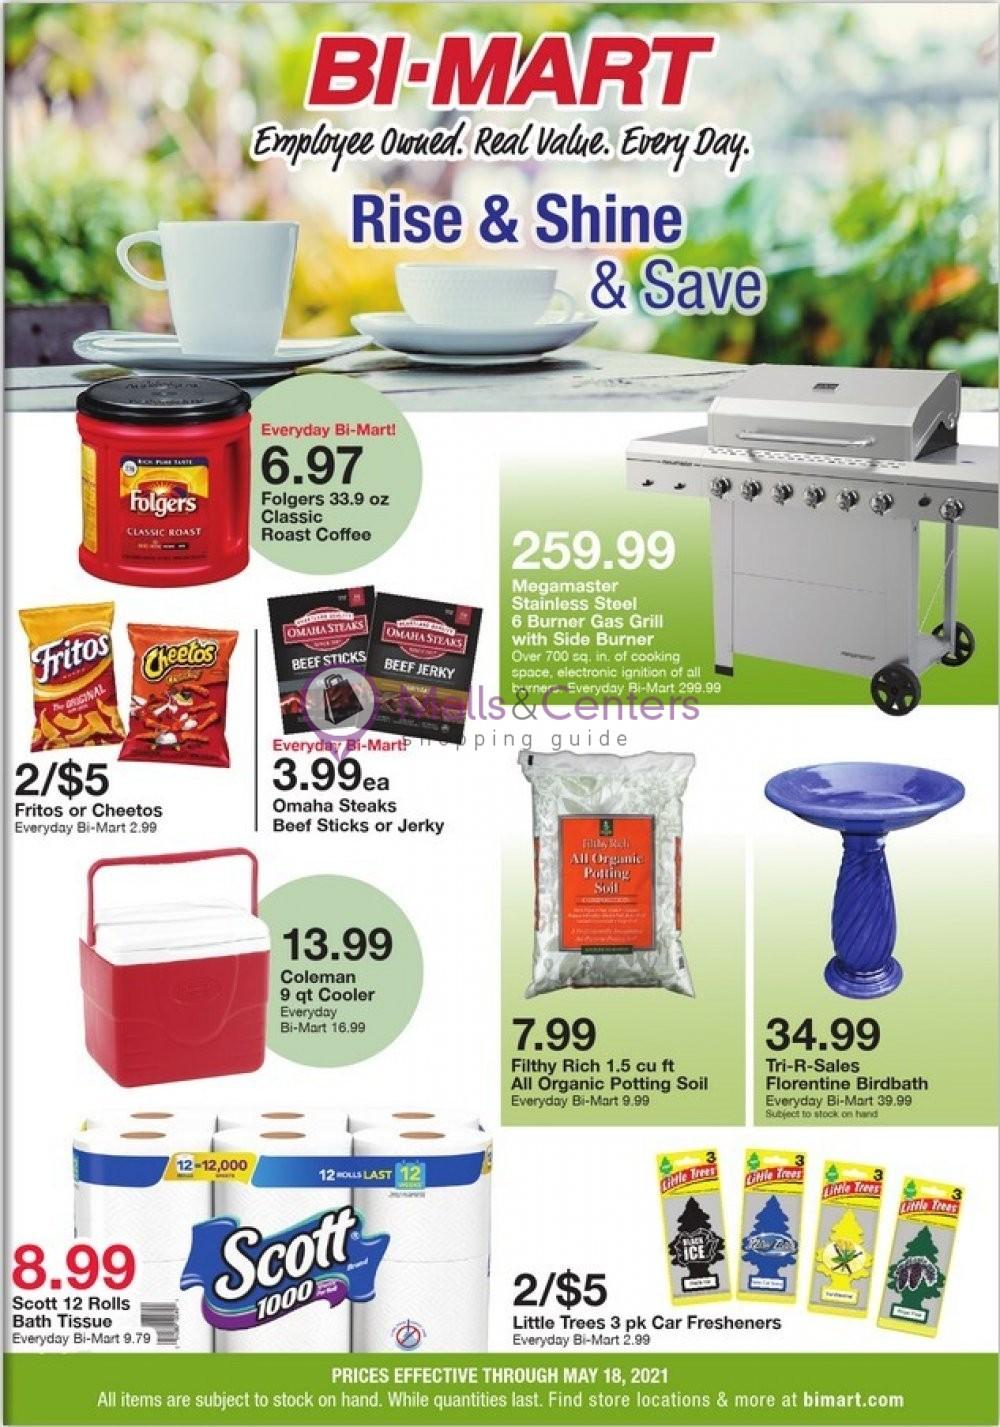 weekly ads Bi-Mart - page 1 - mallscenters.com